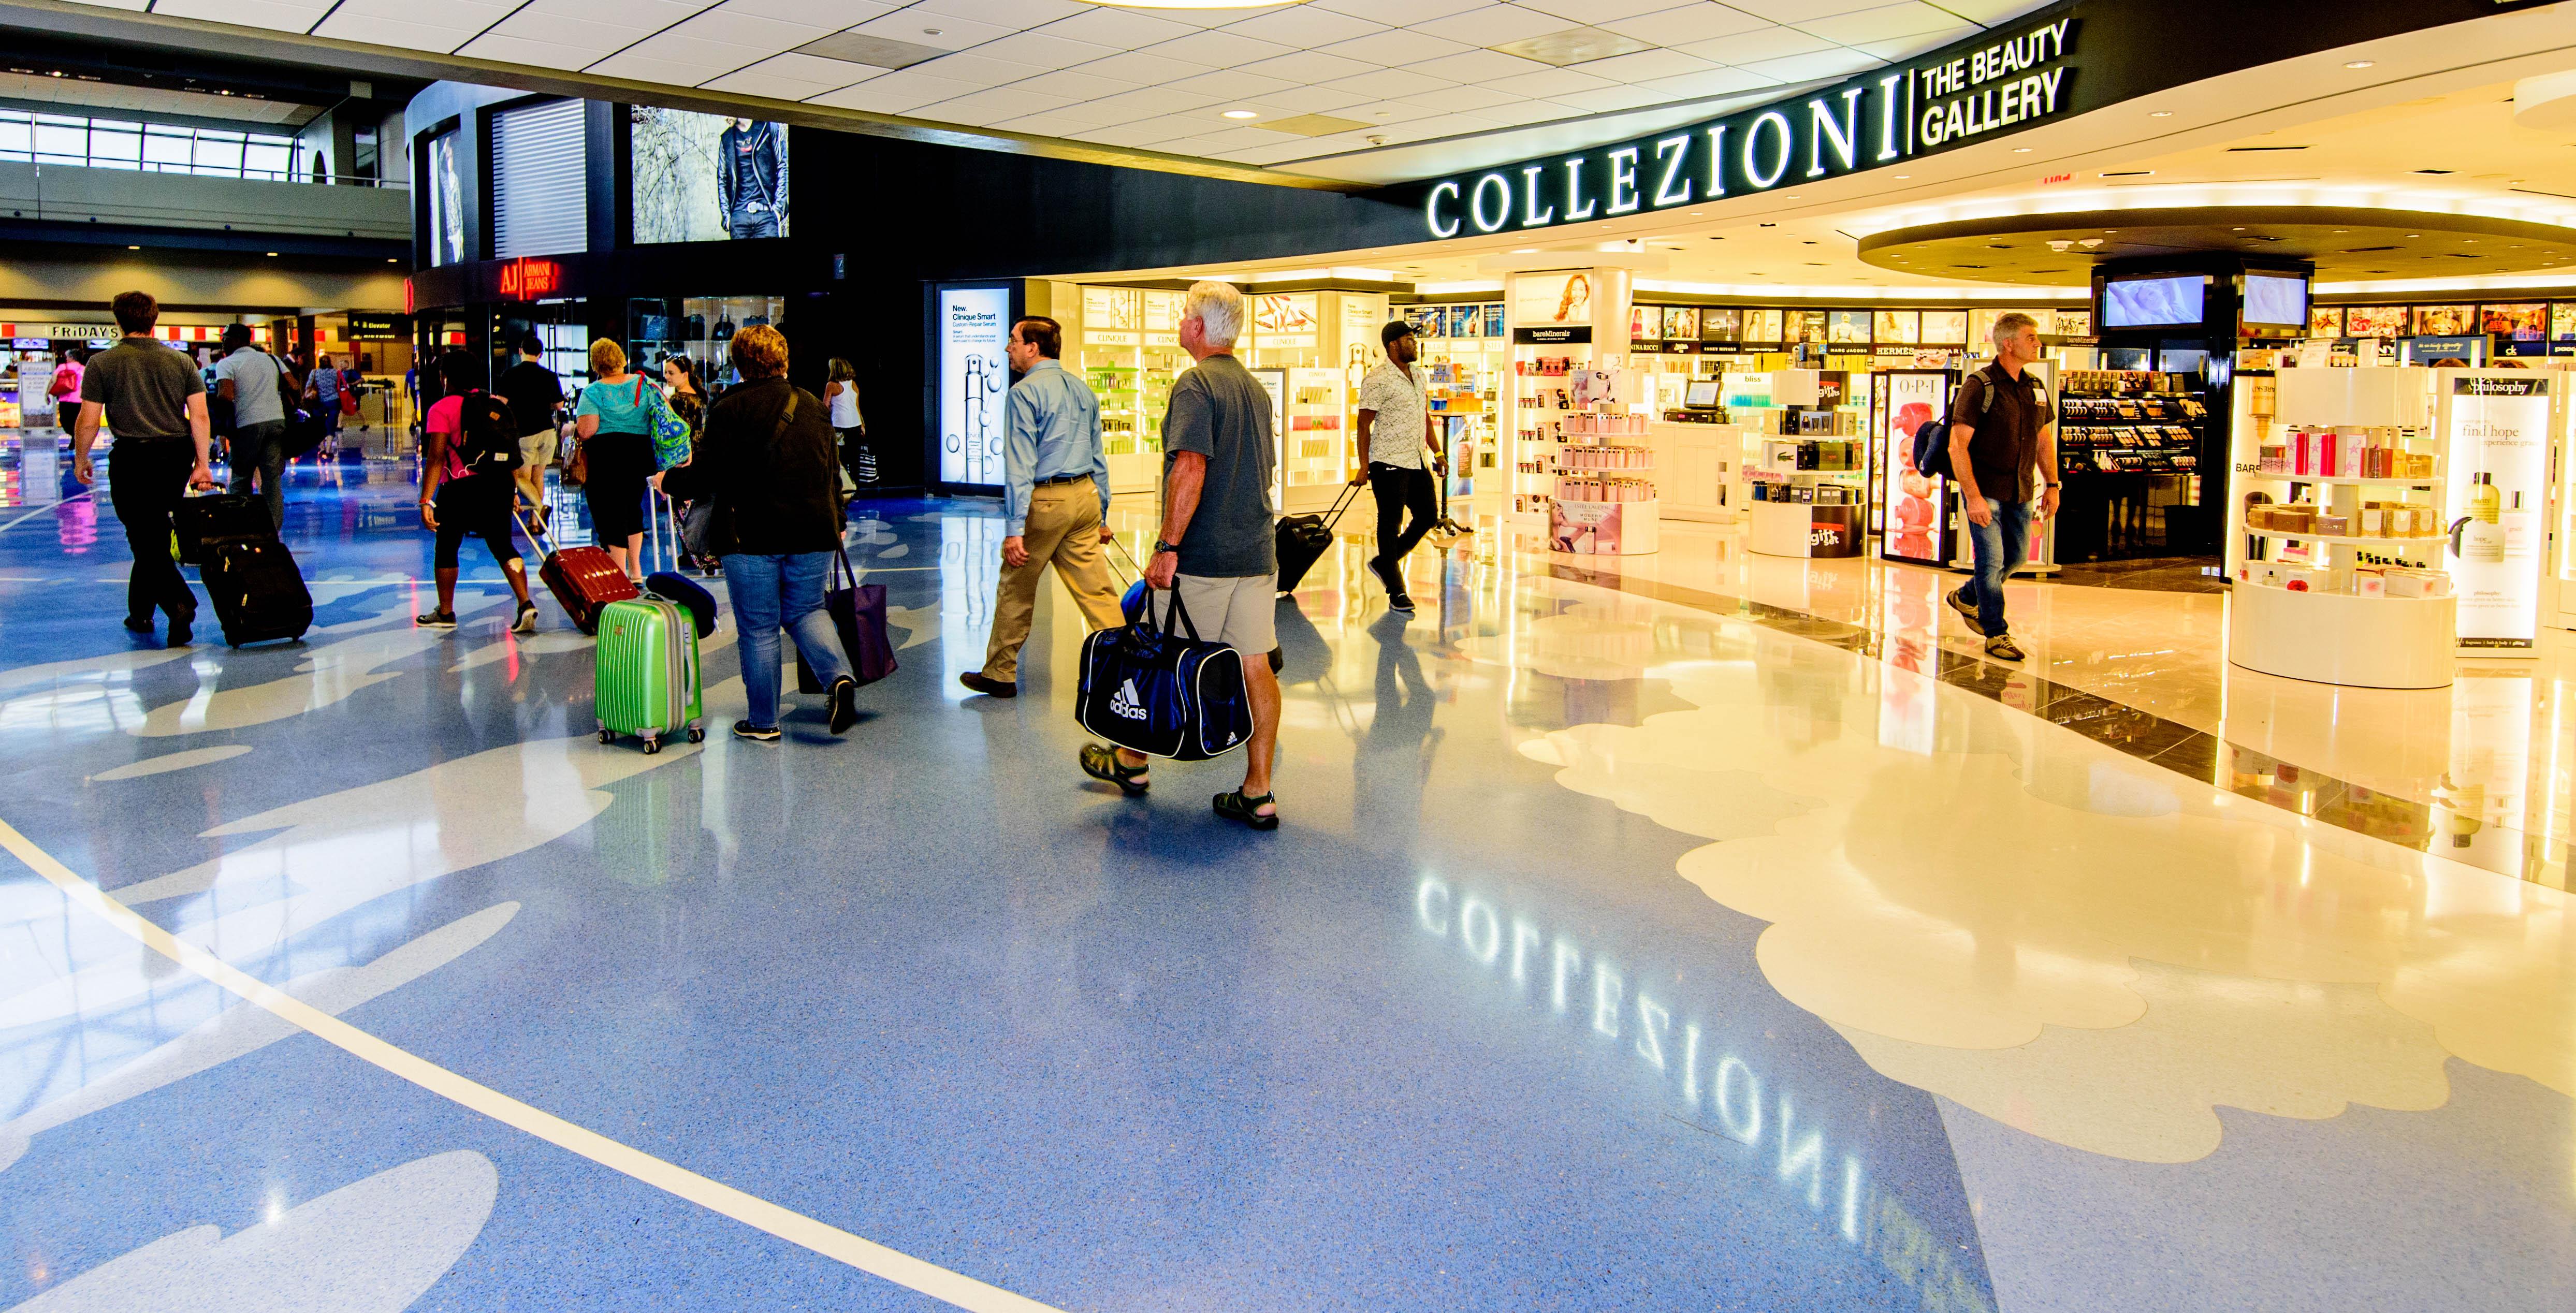 Beauty Shop Collezioni inside the airport.